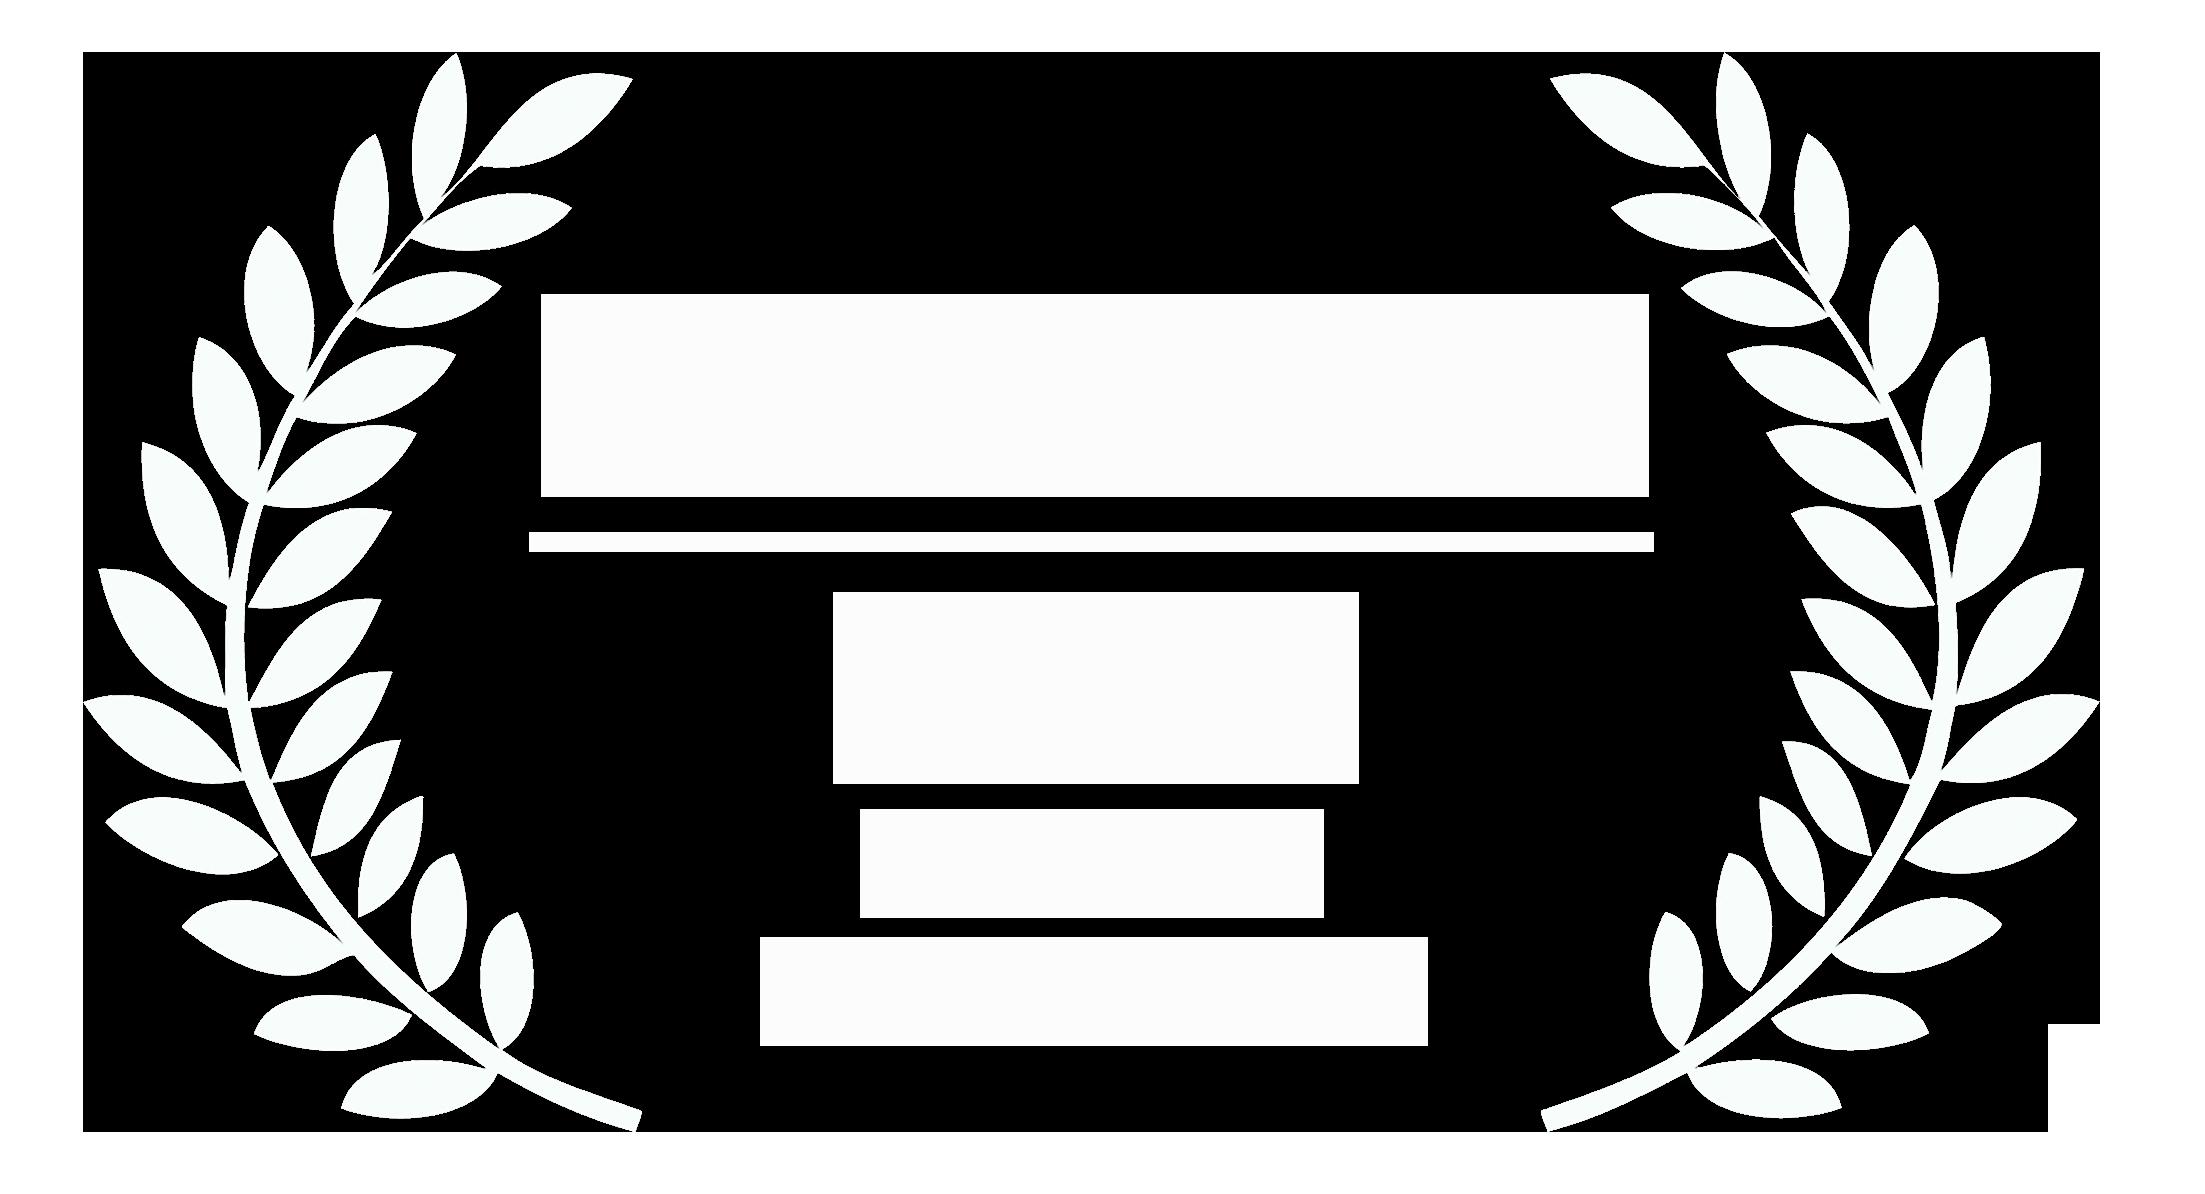 Banff_white.png